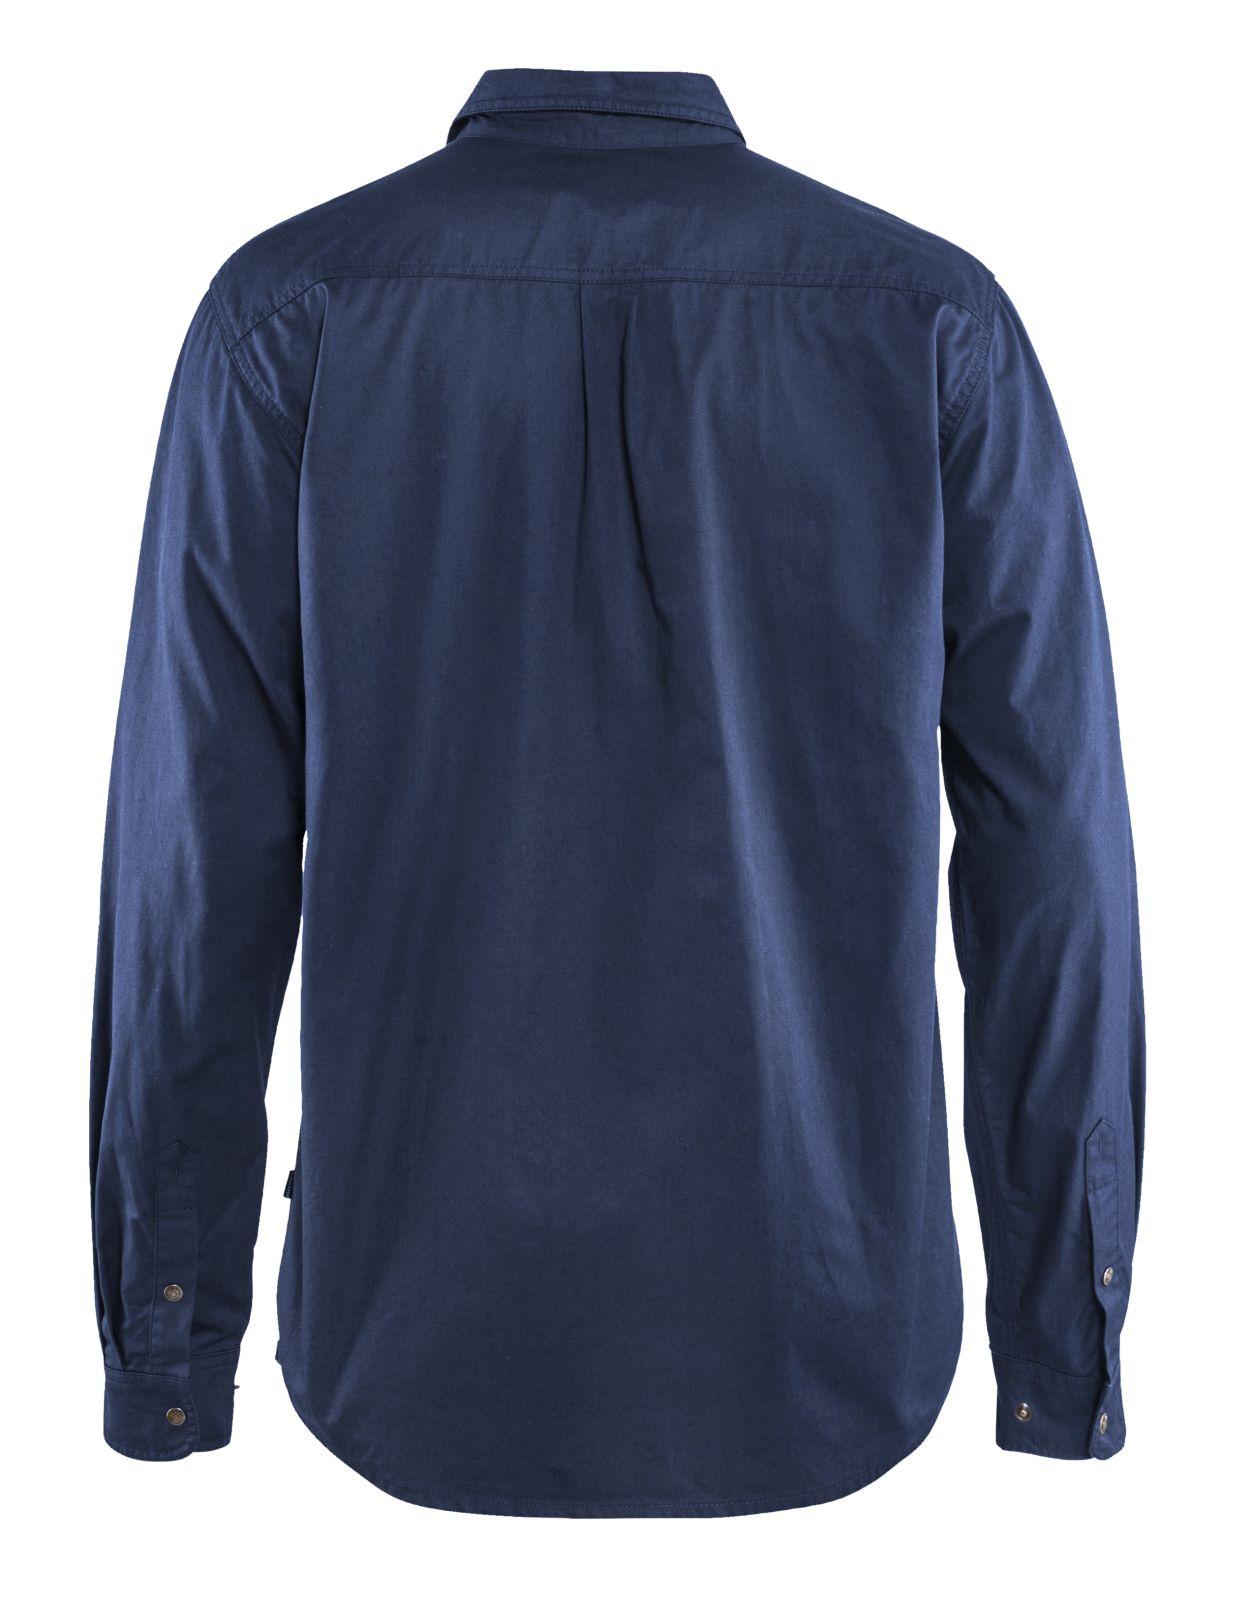 Blaklader Overhemden 32971135 marineblauw(8900)